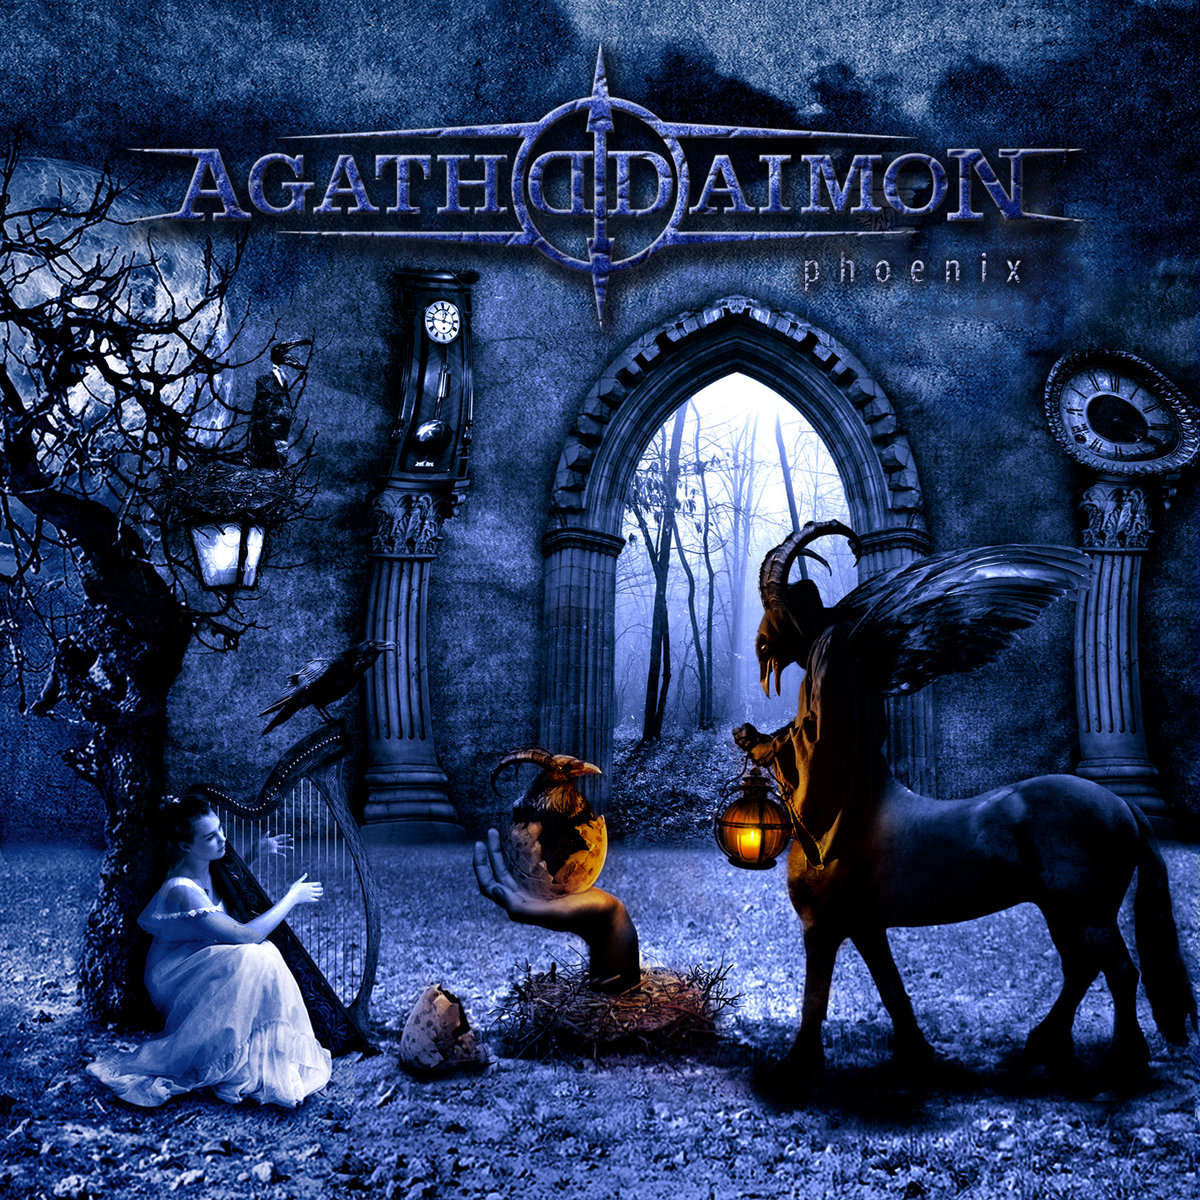 discografia agathodaimon